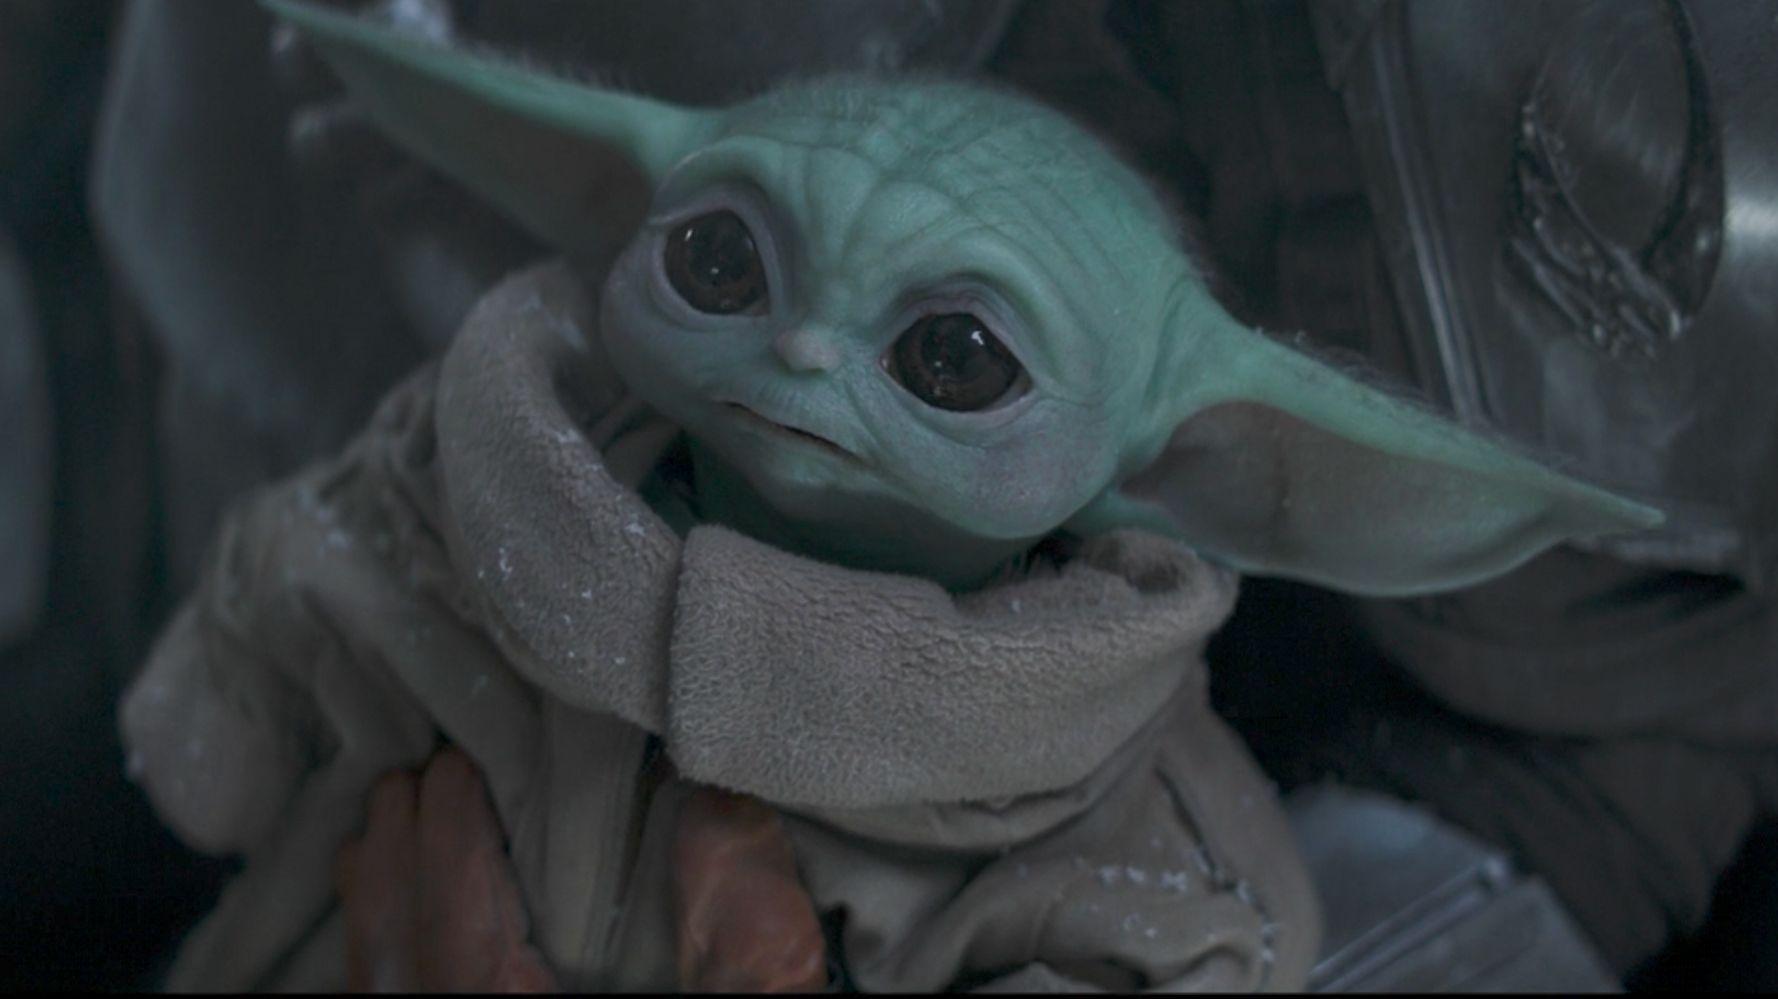 Lucasfilm Exec Defends Disturbing Baby Yoda Moment